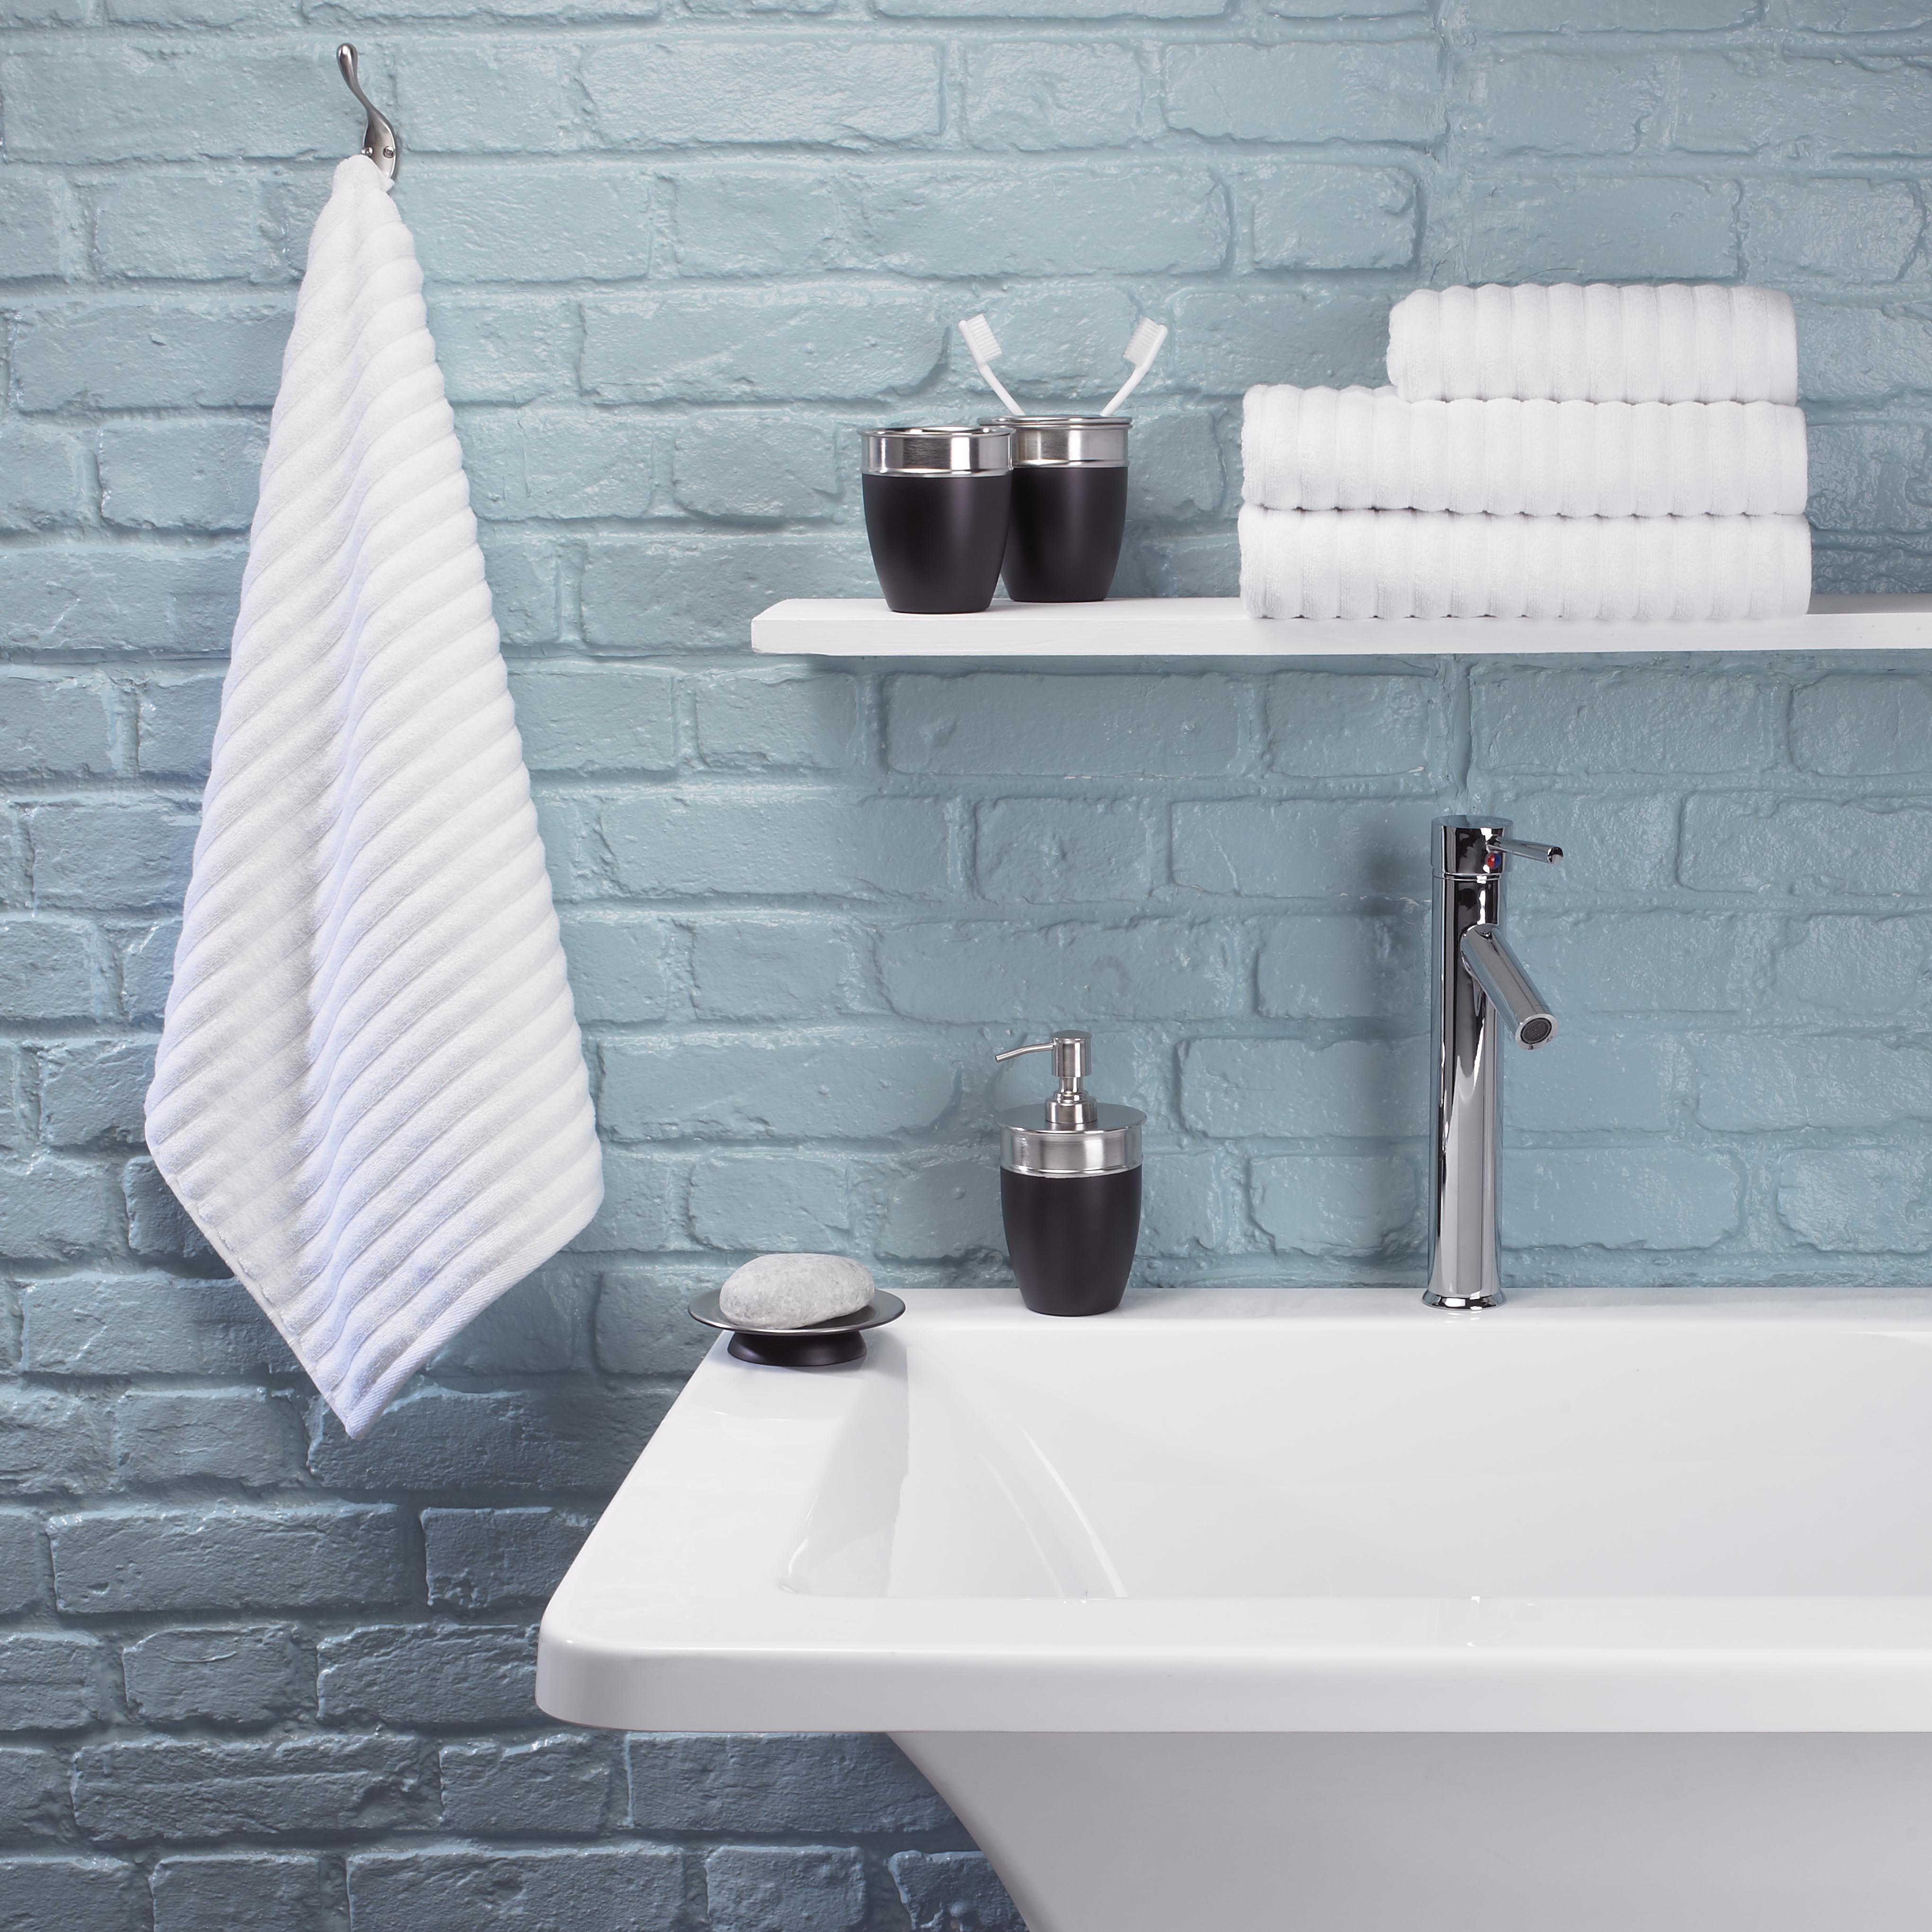 Towel Ribbed jacqaurd White